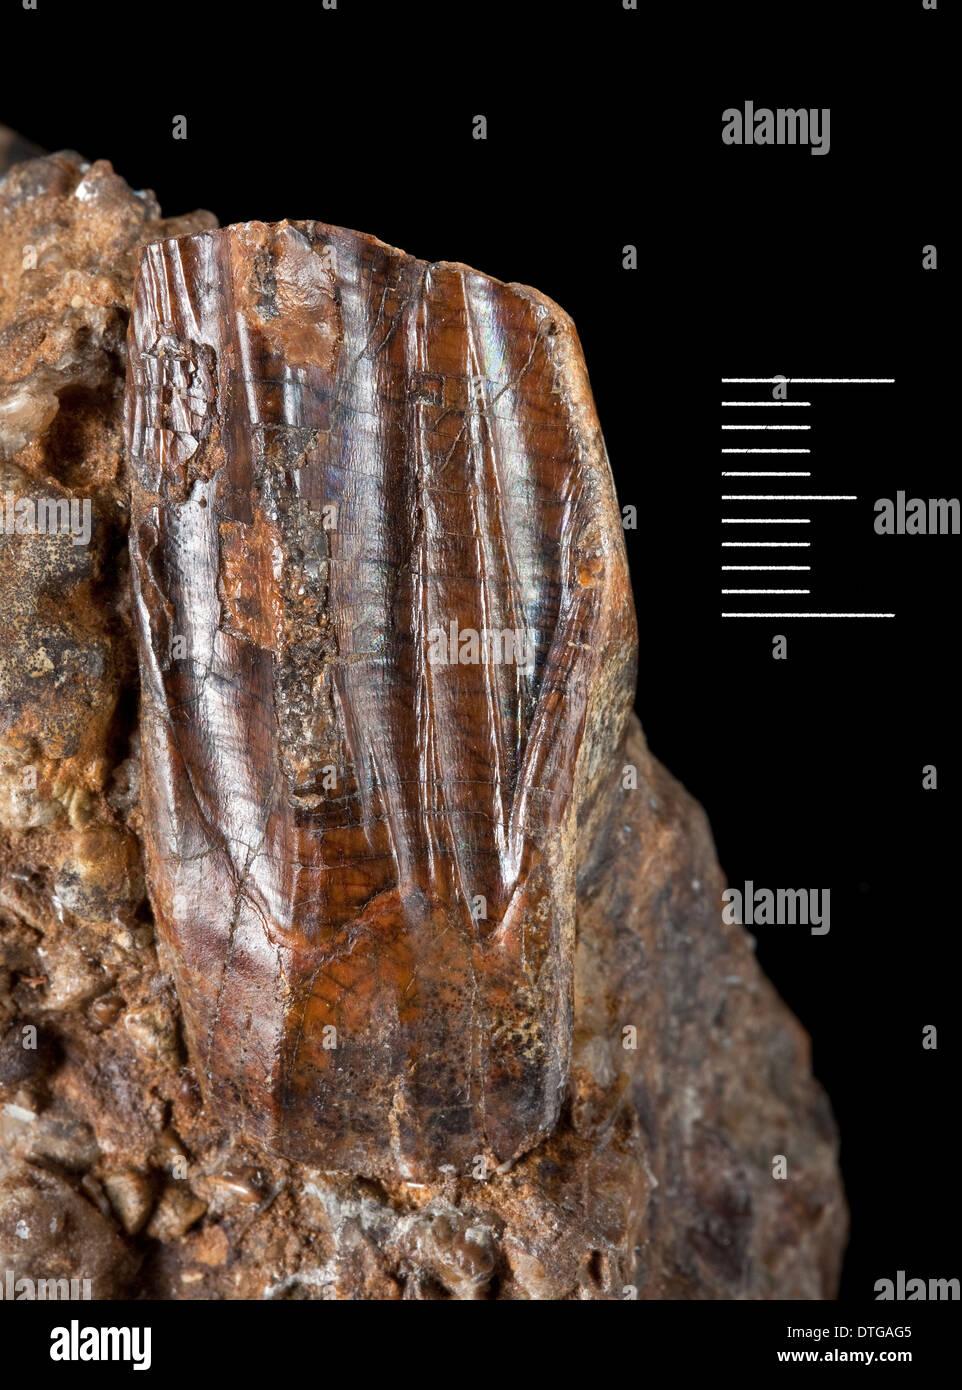 Iguanodon tooth - Stock Image